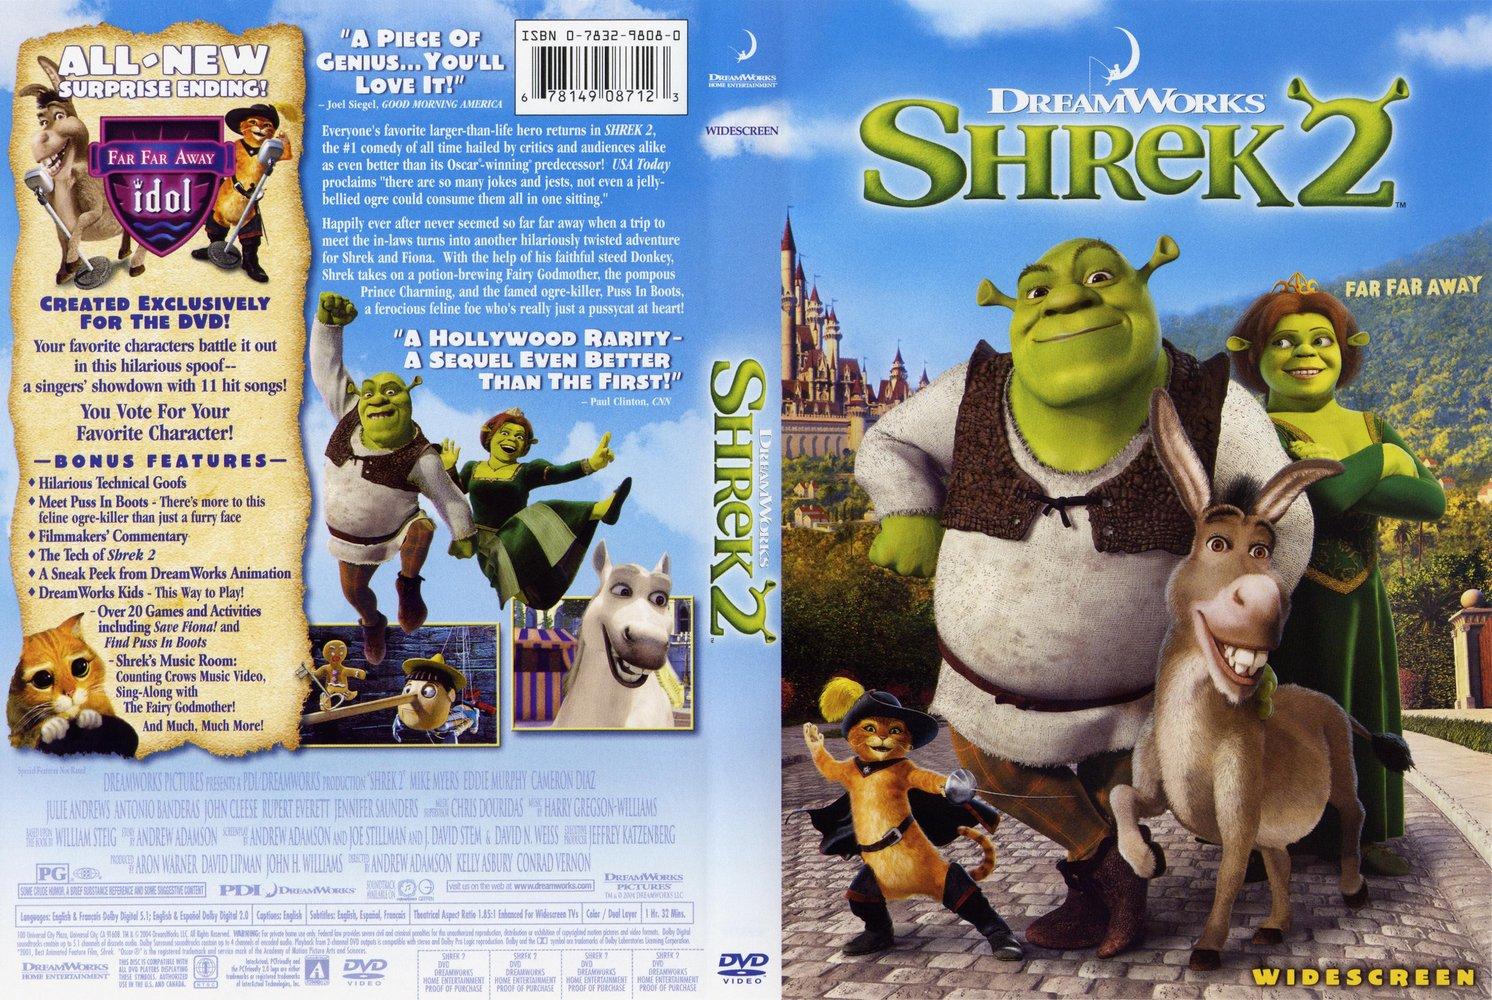 Shrek_2-%5Bcdcovers_cc%5D-front.jpg